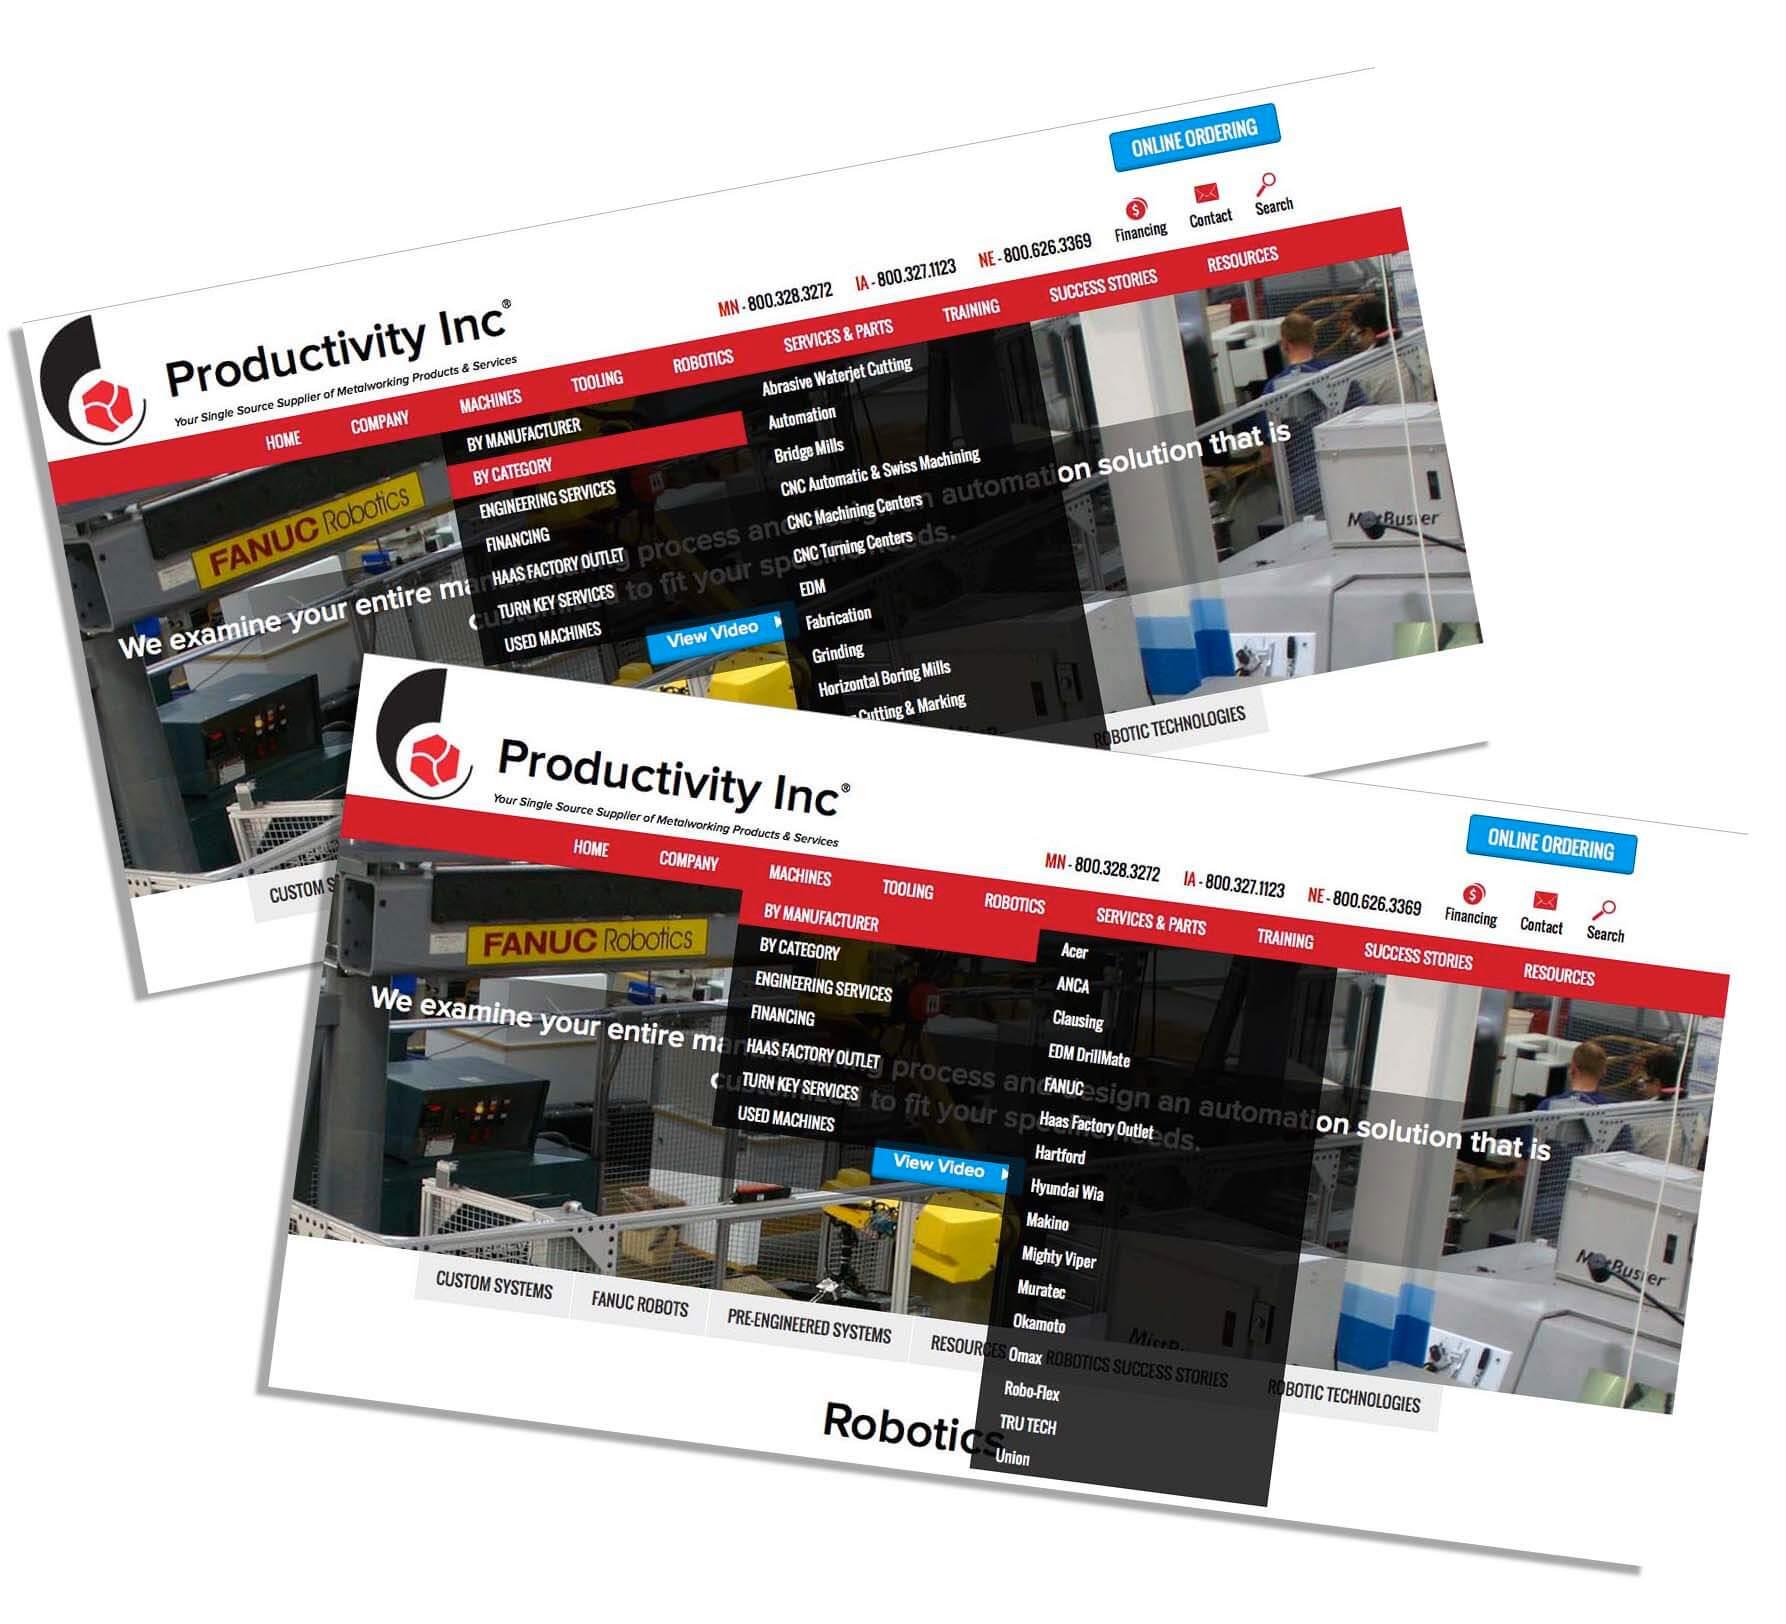 productivity machine tools